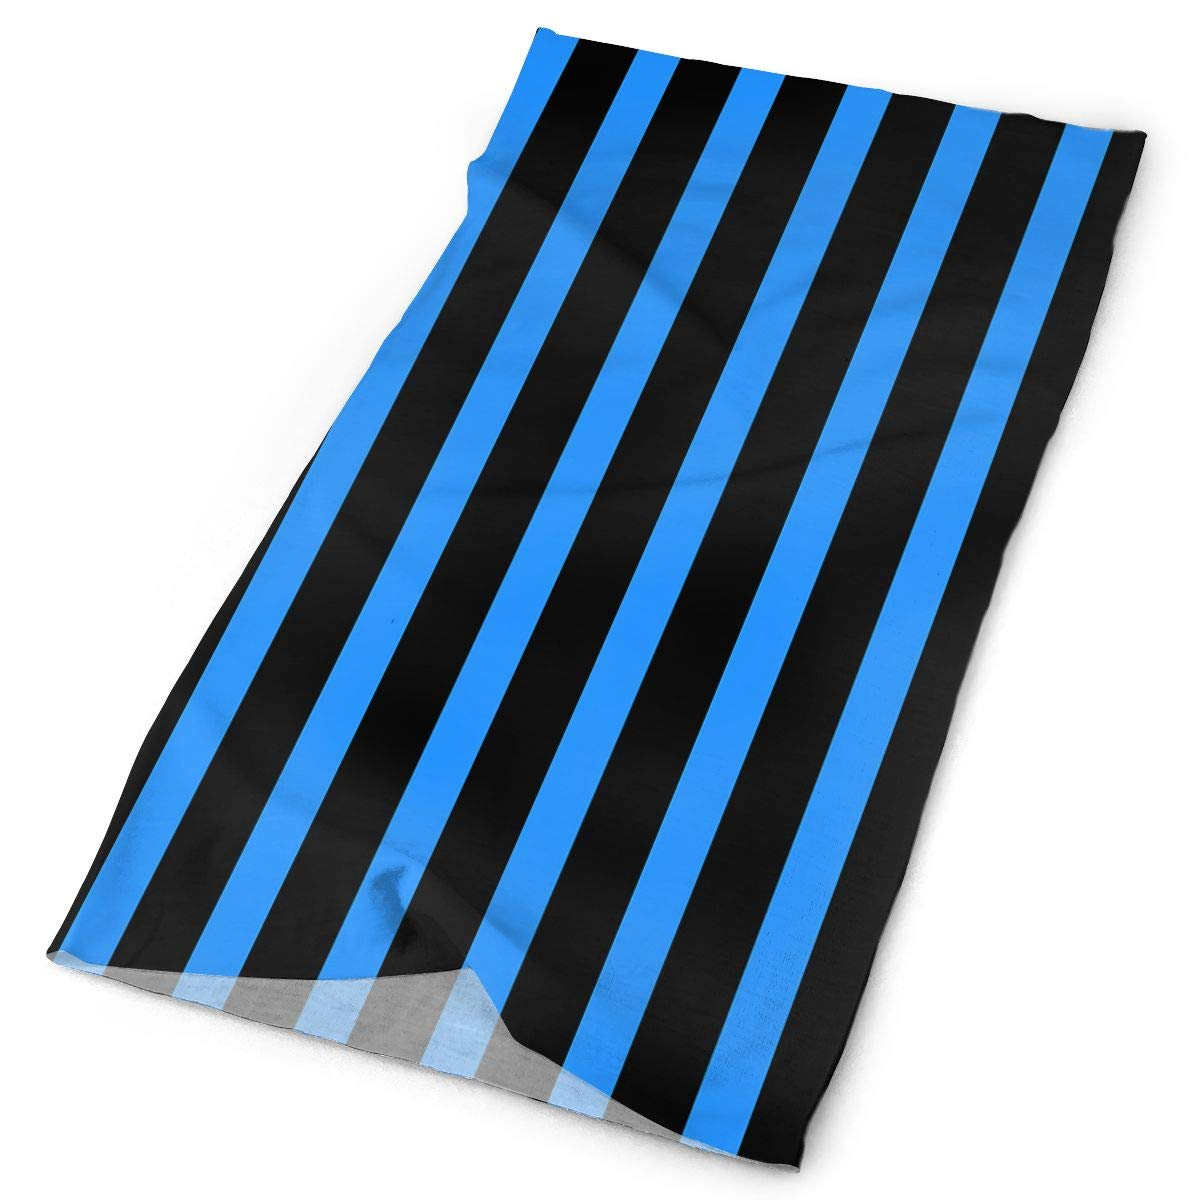 Owen Pullman Multifunctional Headwear Blue Line Ligth Head Wrap Elastic Turban Sport Headband Outdoor Sweatband